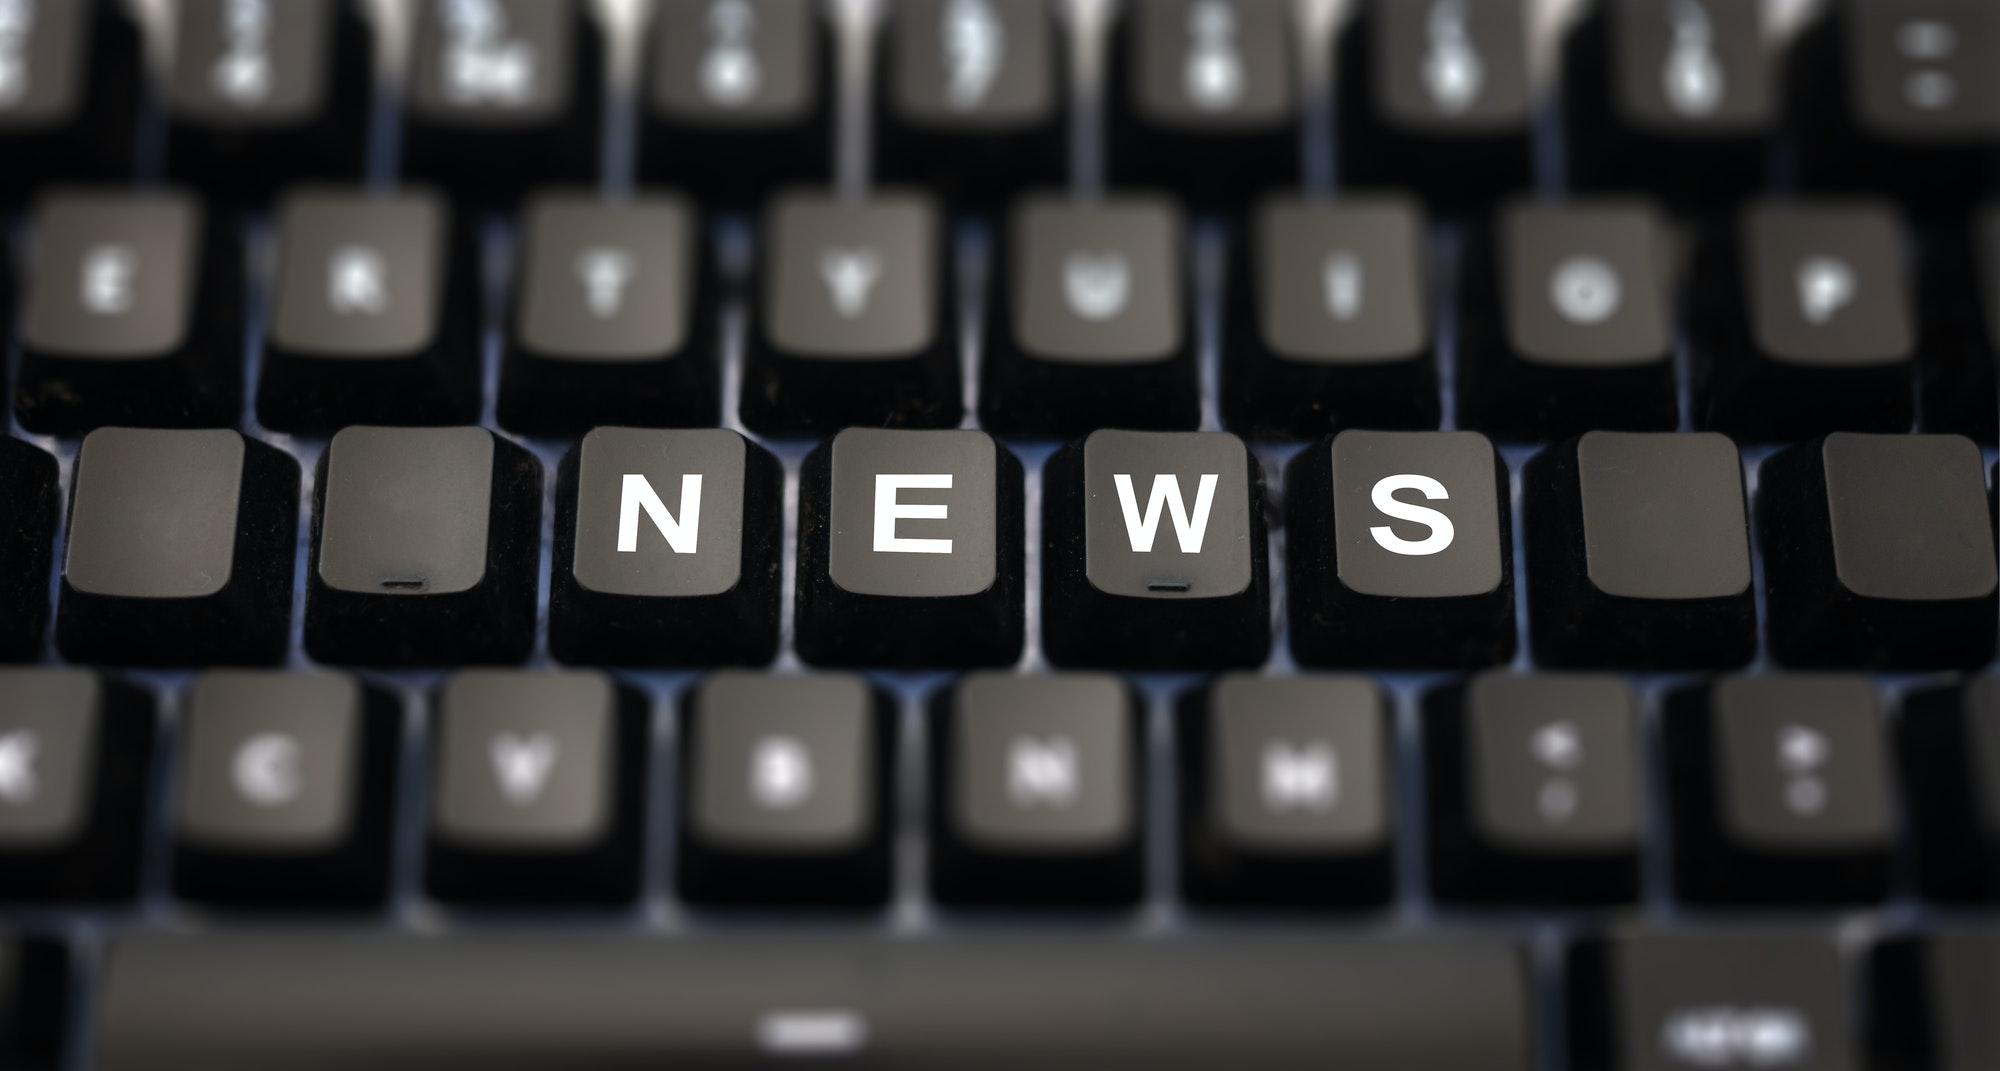 Online news, journalism concept.